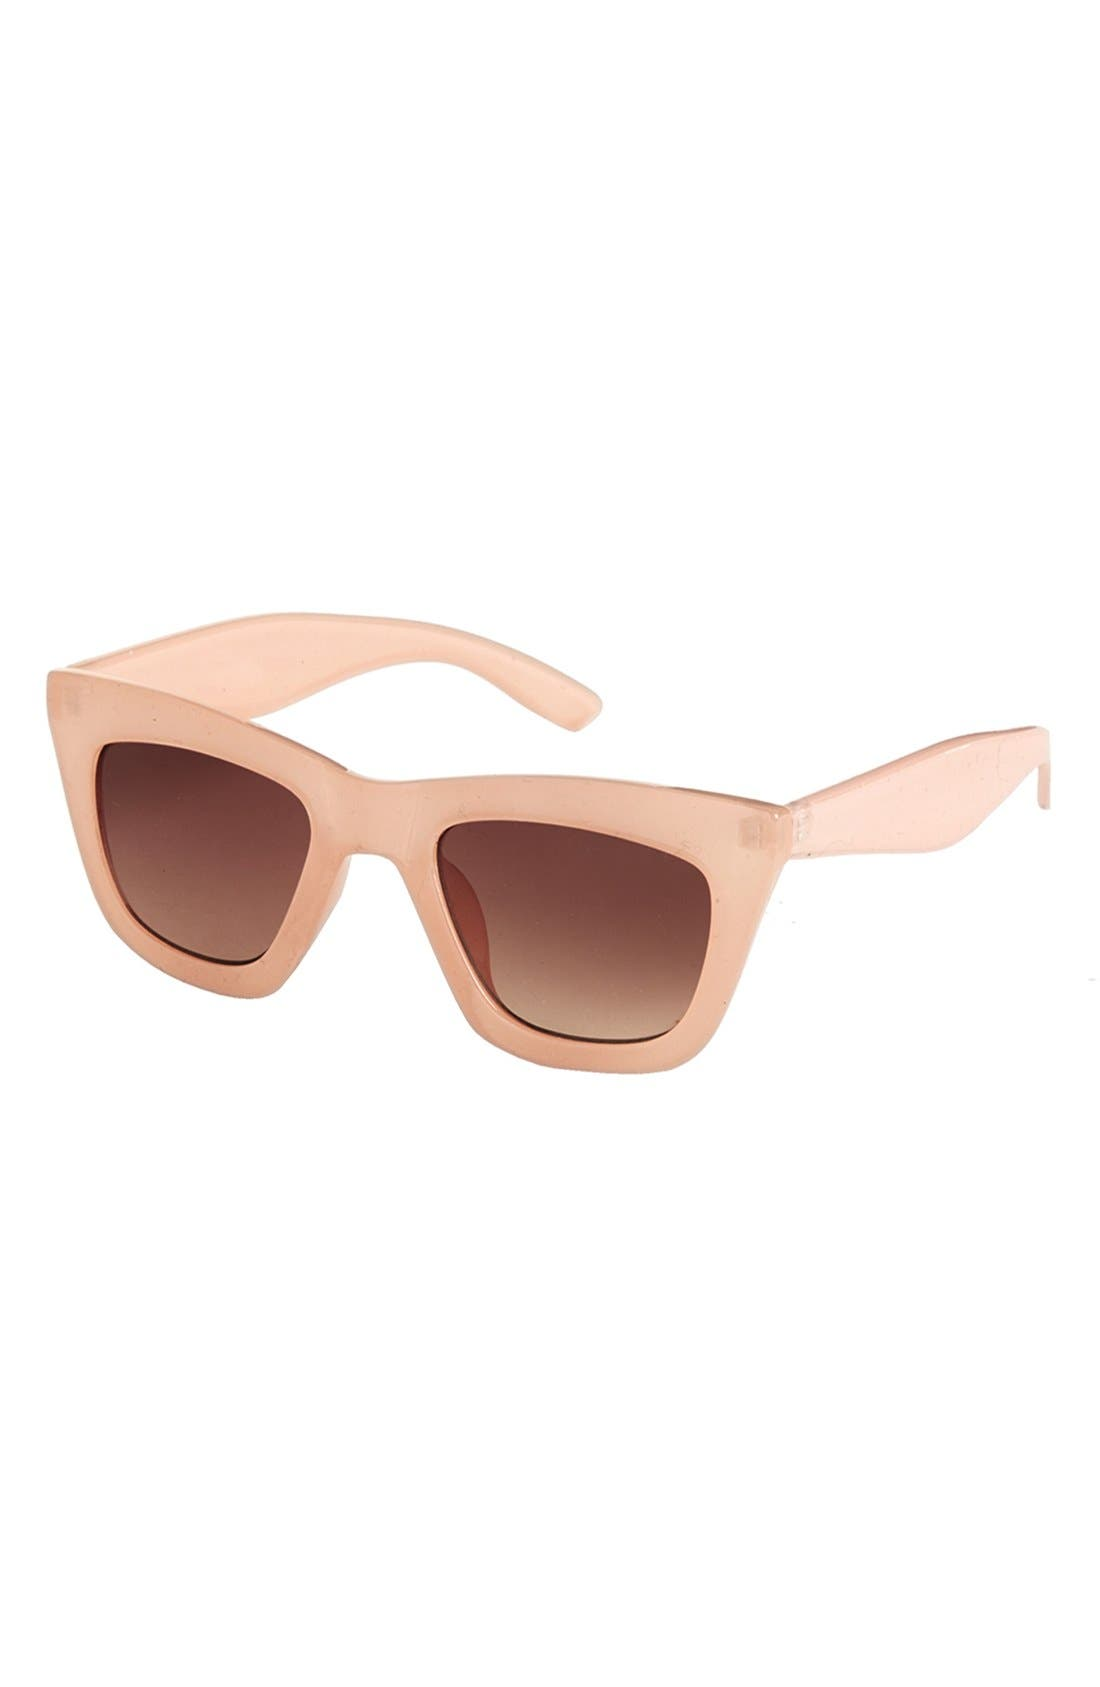 Alternate Image 1 Selected - Topshop 'Cruella' 49mm Cat Eye Sunglasses